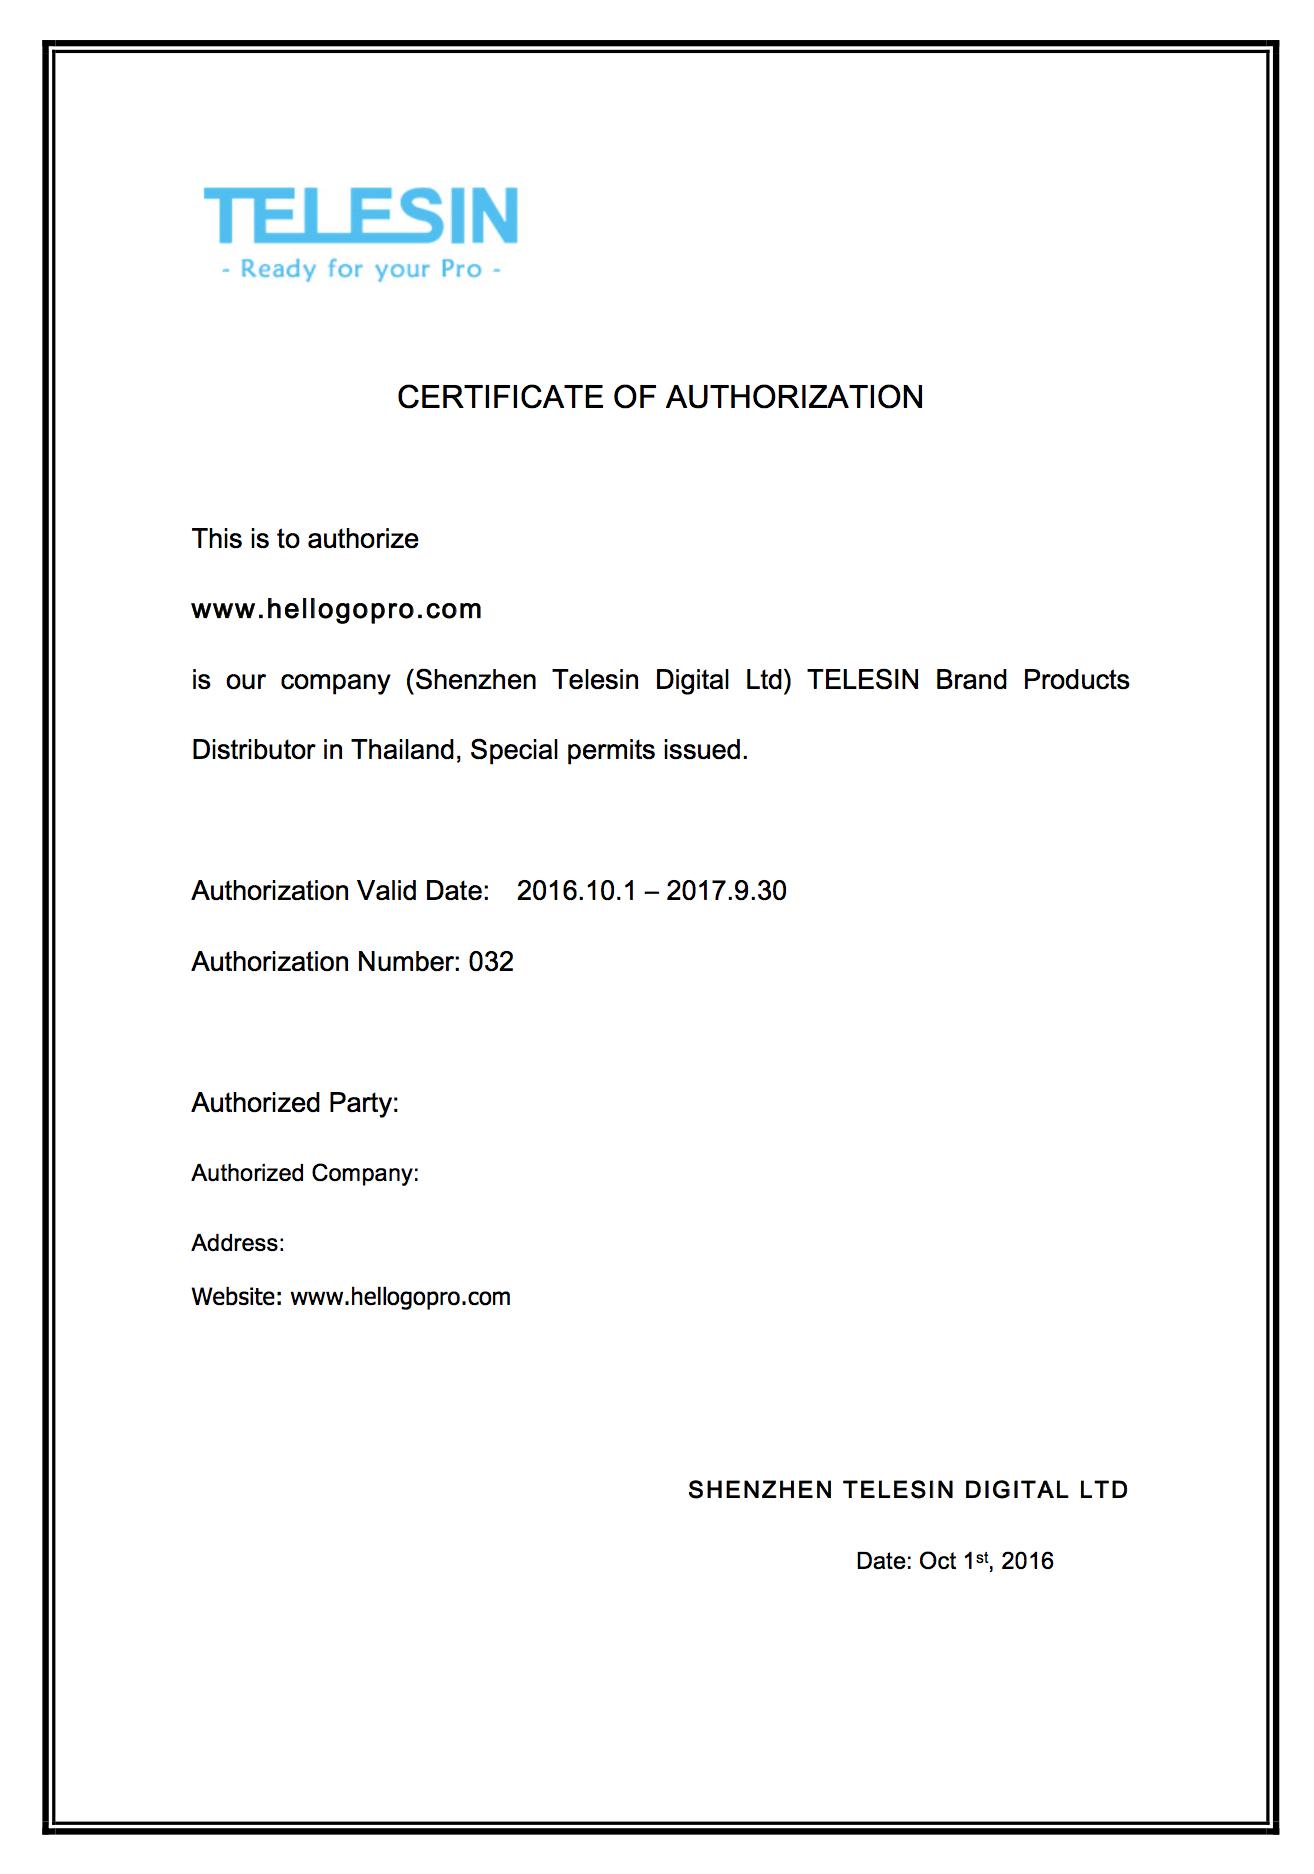 Telesin Certificate